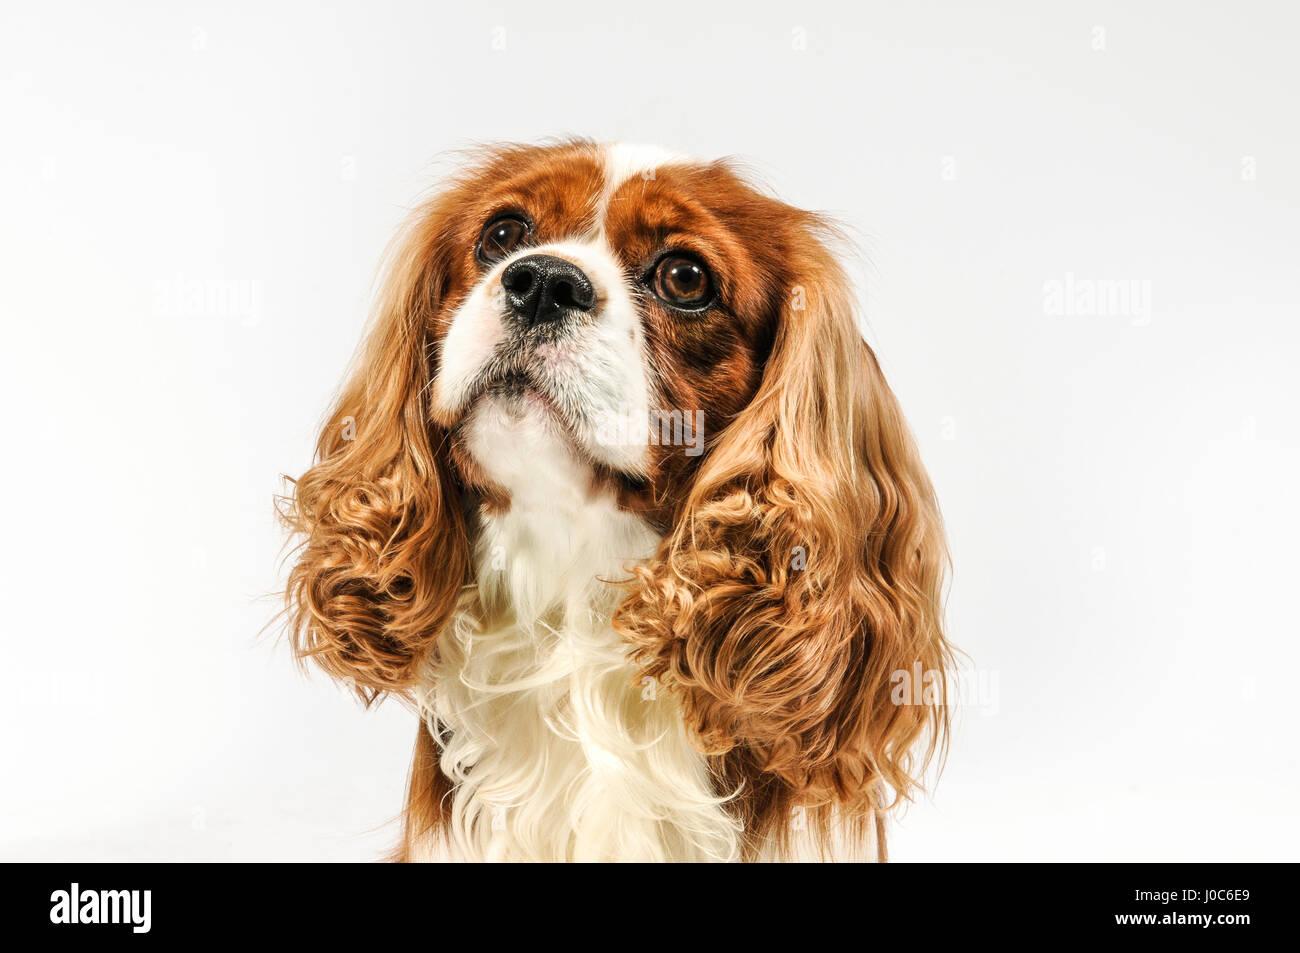 Dog in white background. - Stock Image